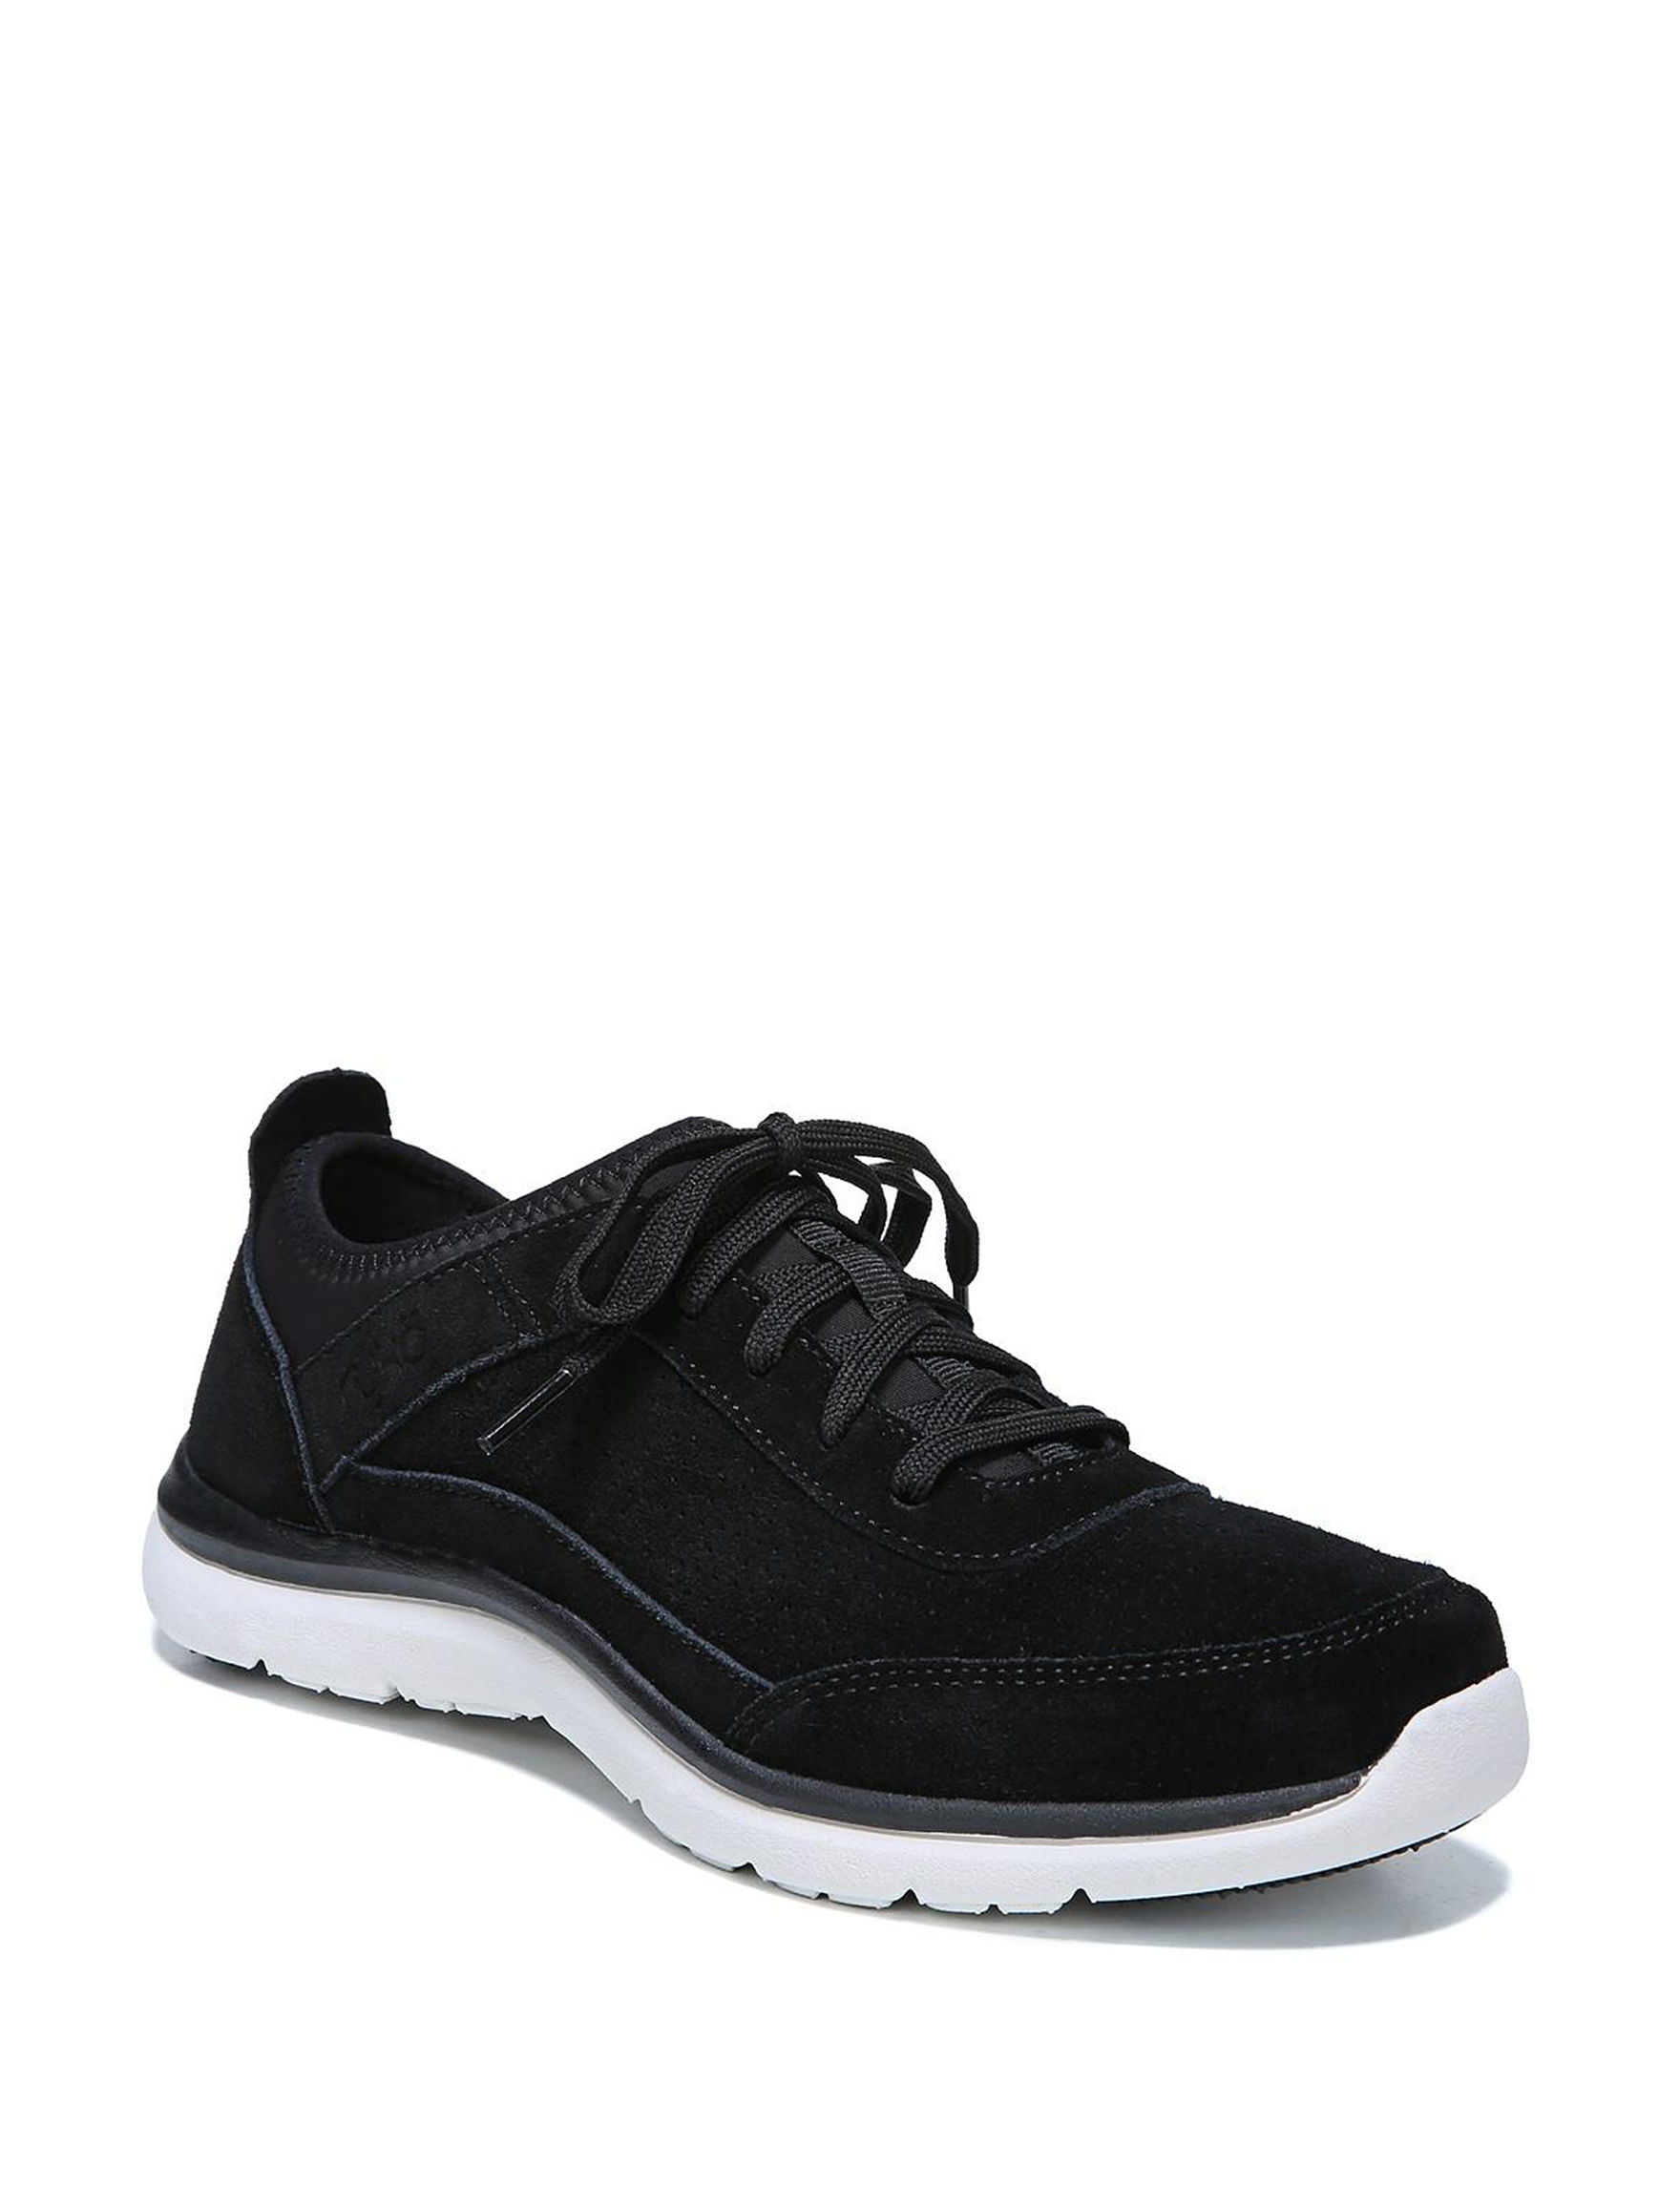 Ryka Black / White Comfort Shoes